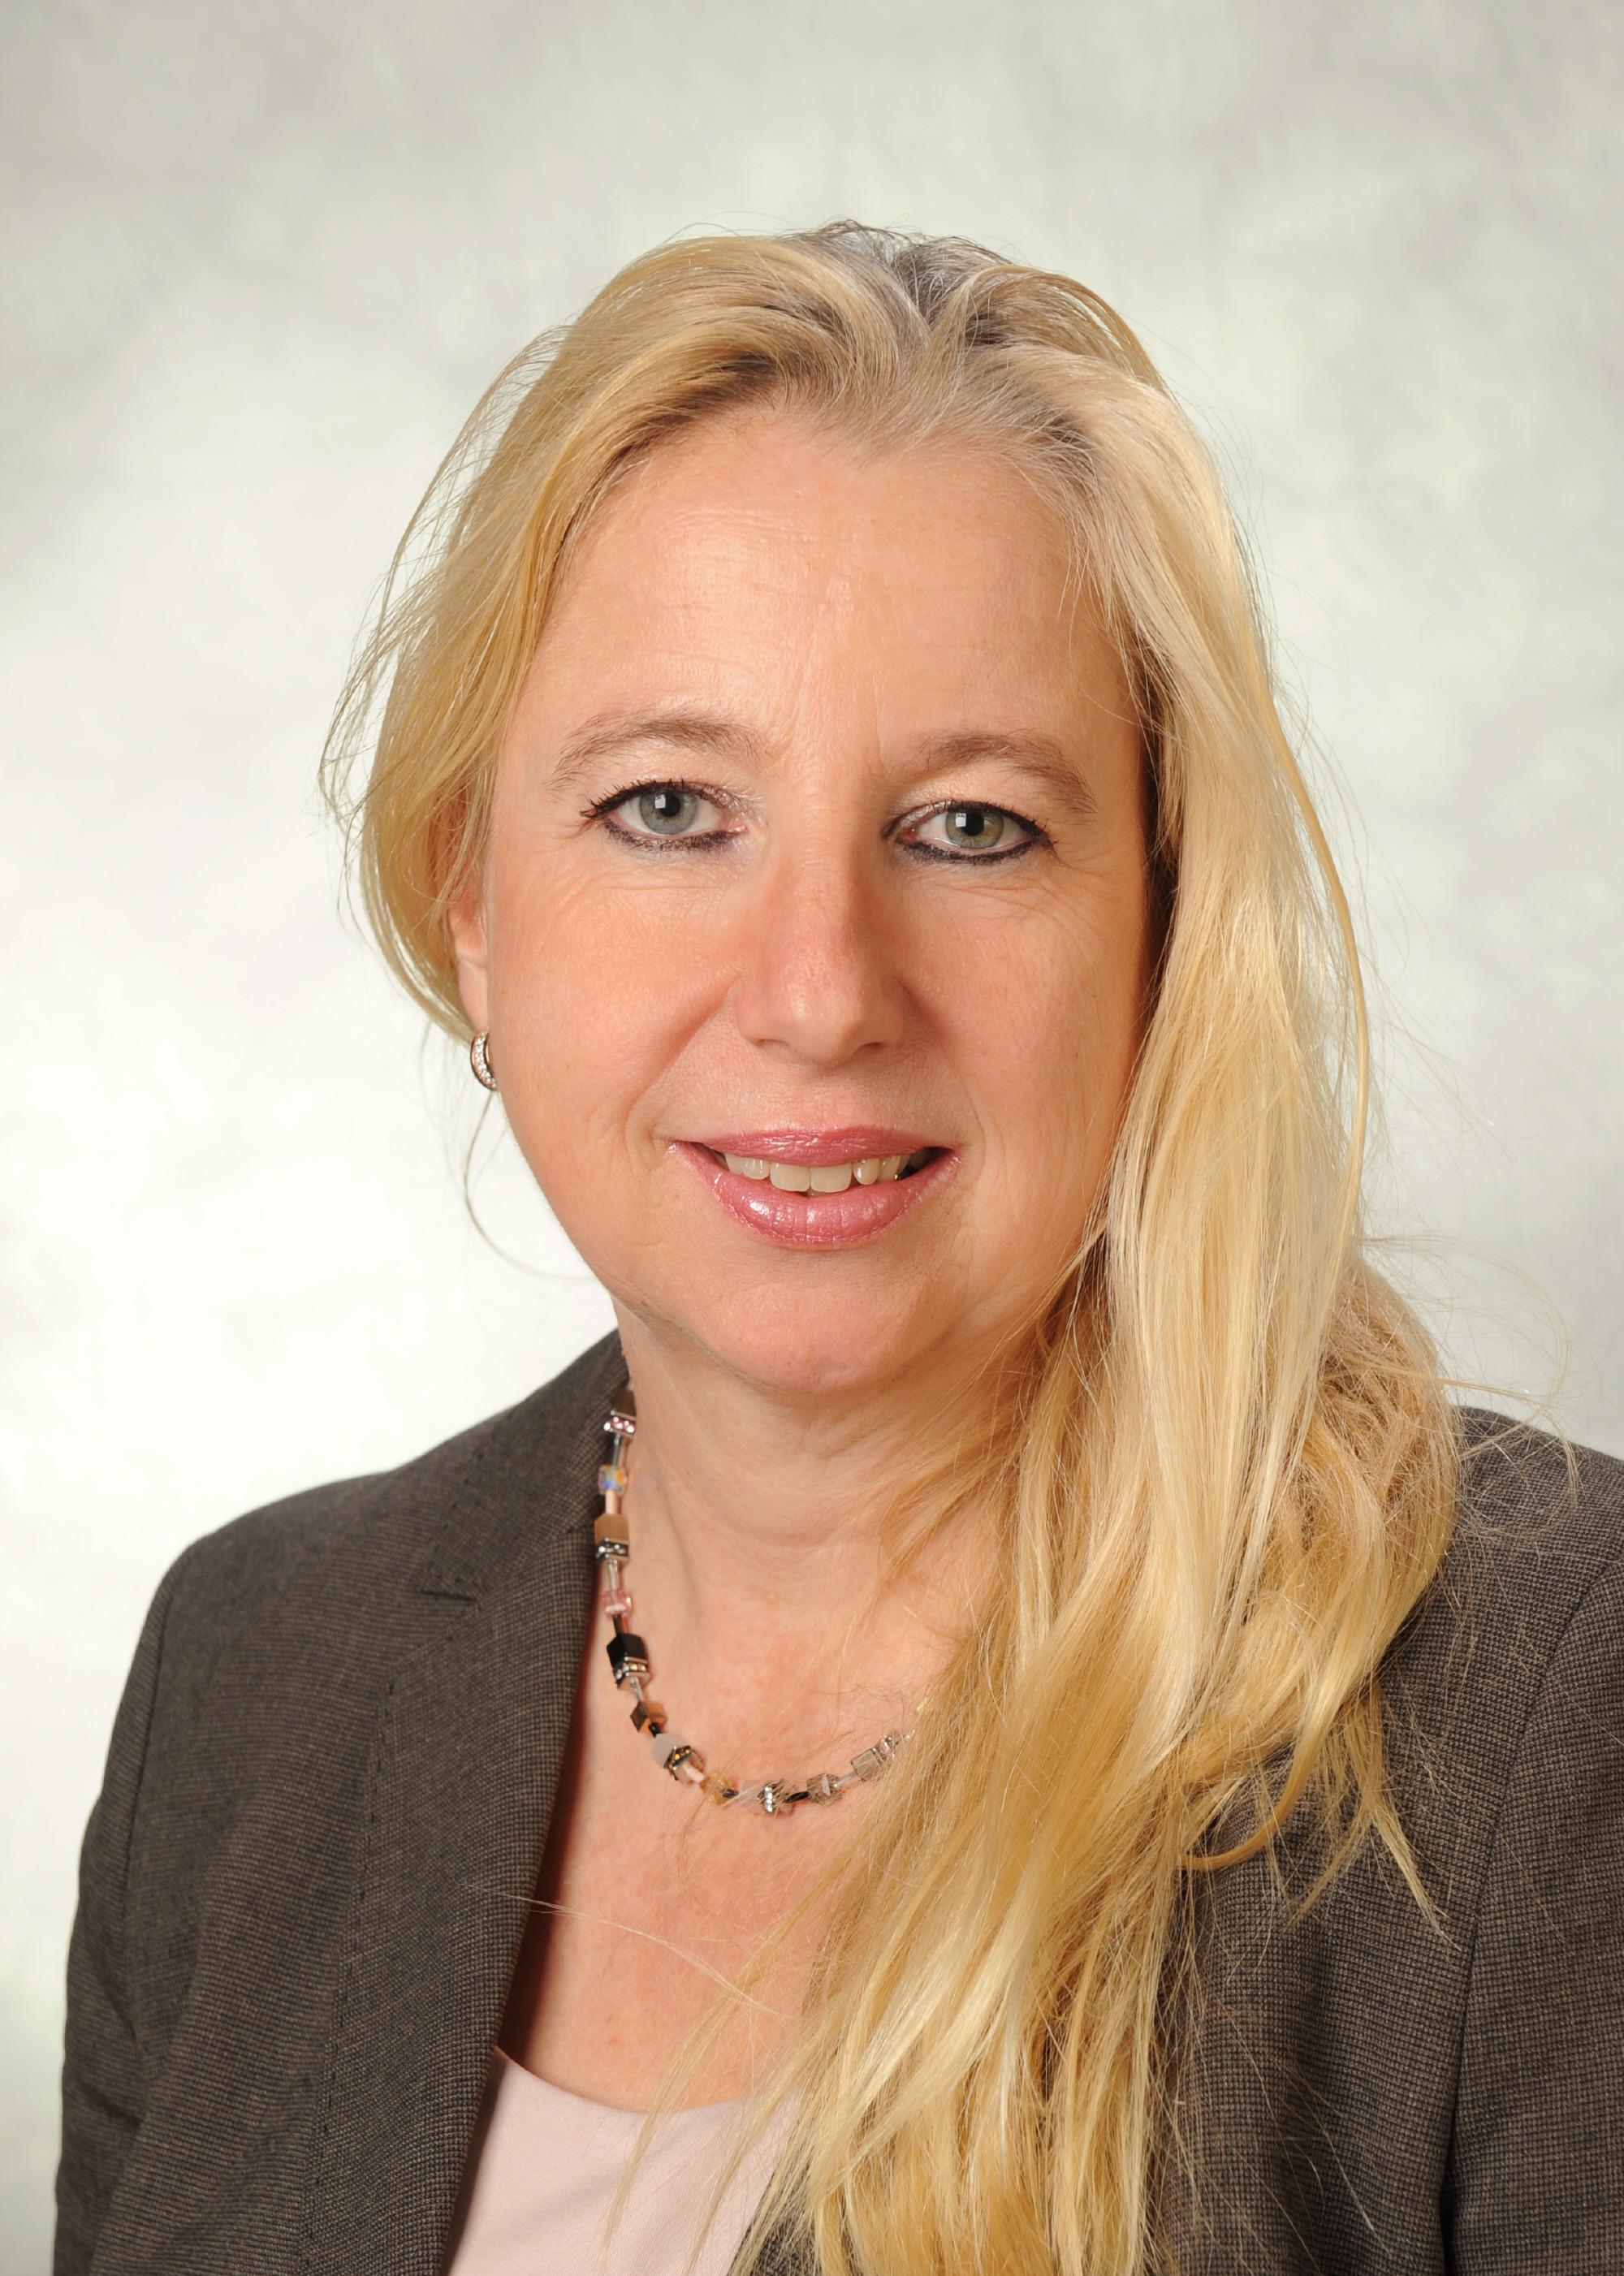 Frau Schmidt-Rosner